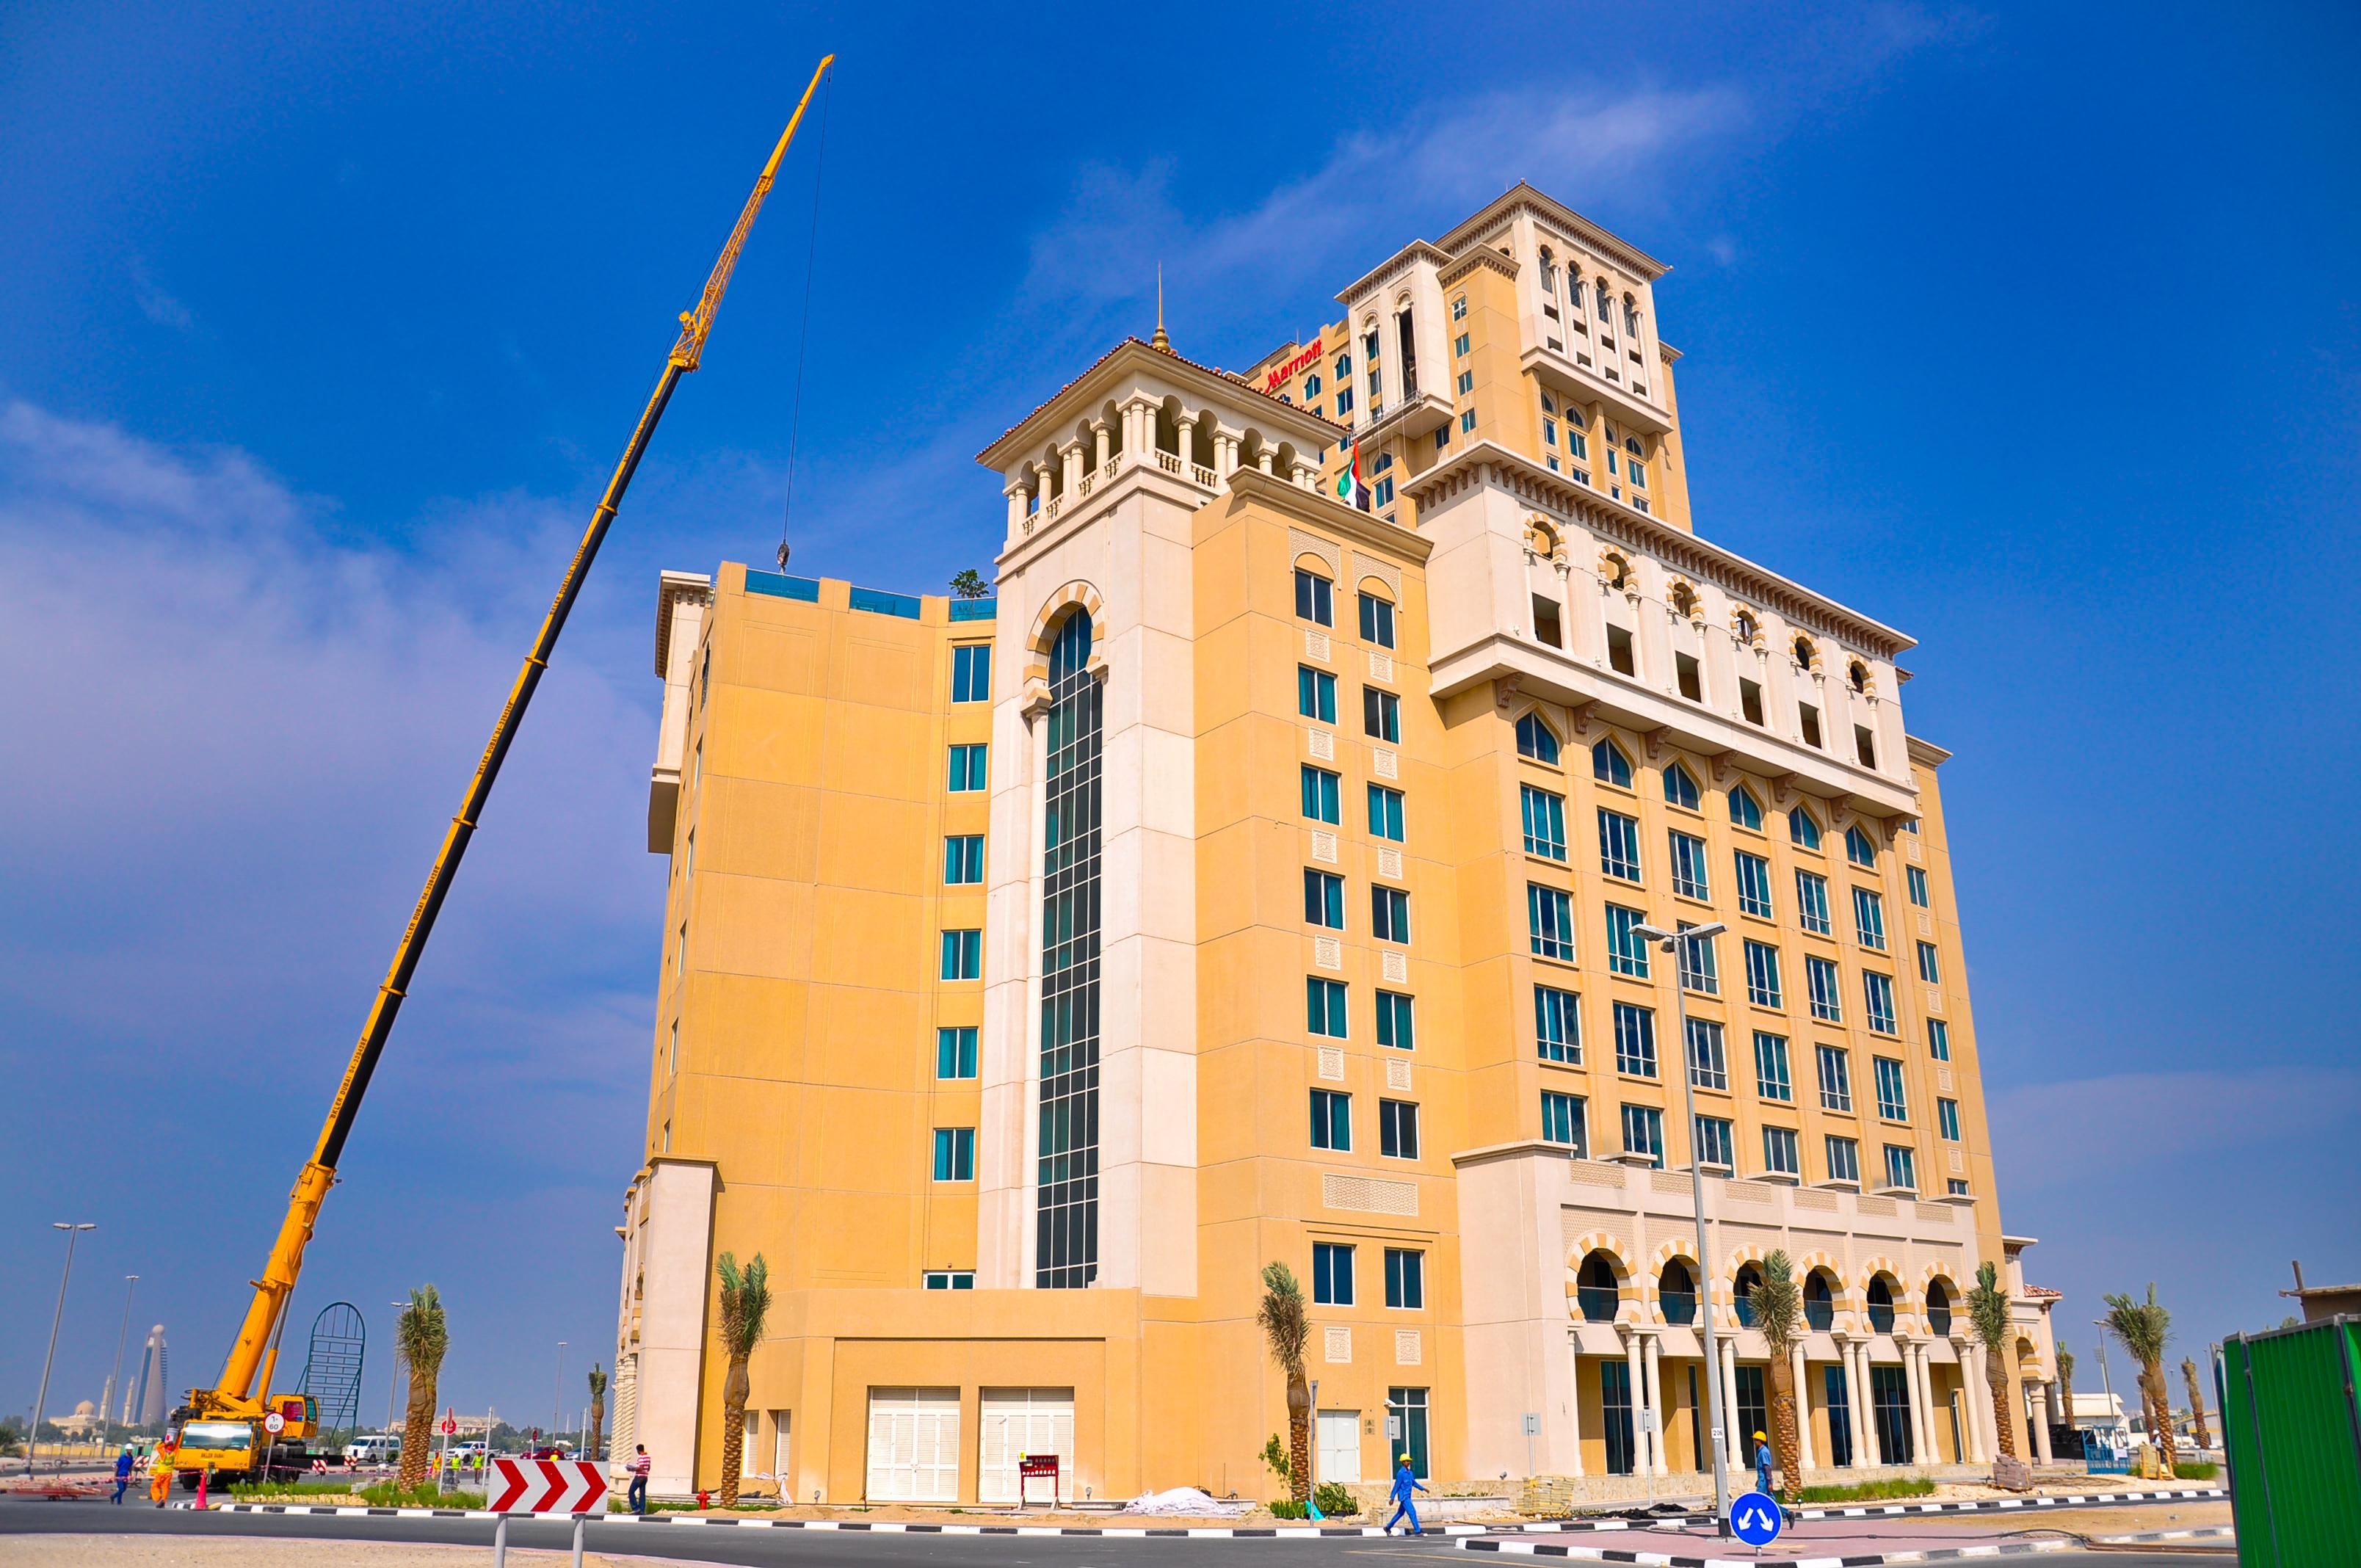 Nilona Tower